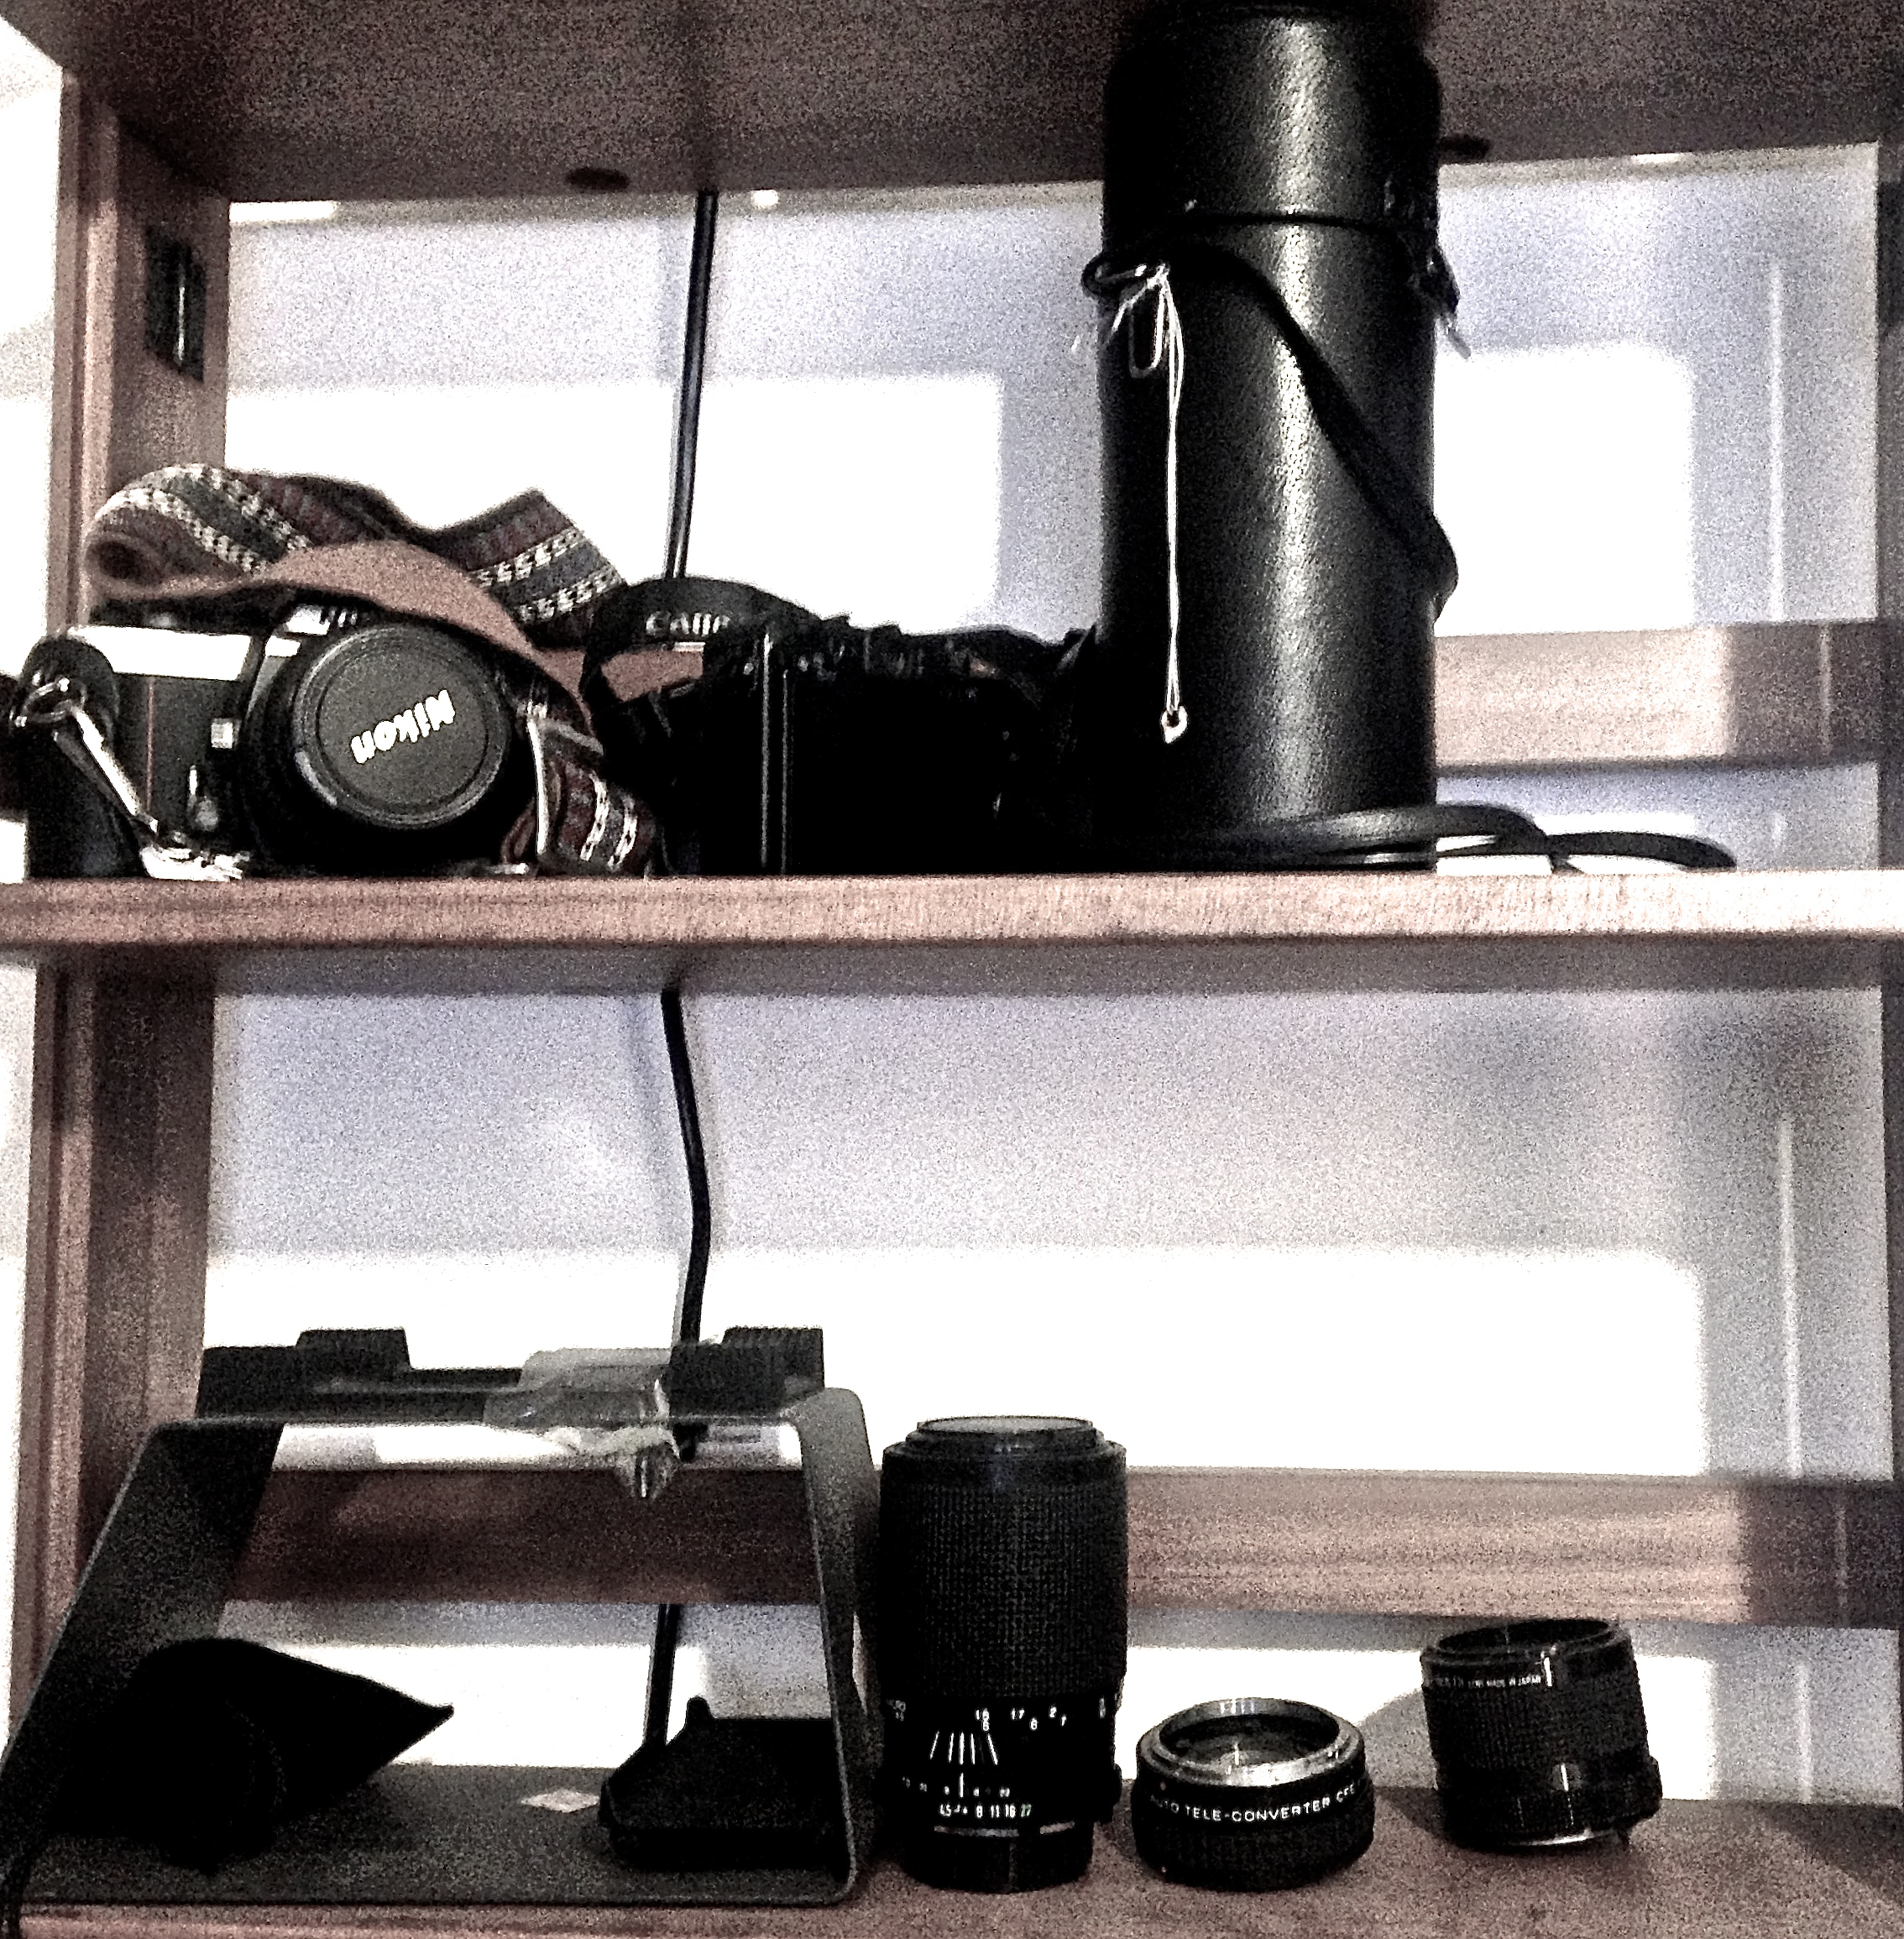 Daniel Lichtenberg studio camera and accessories